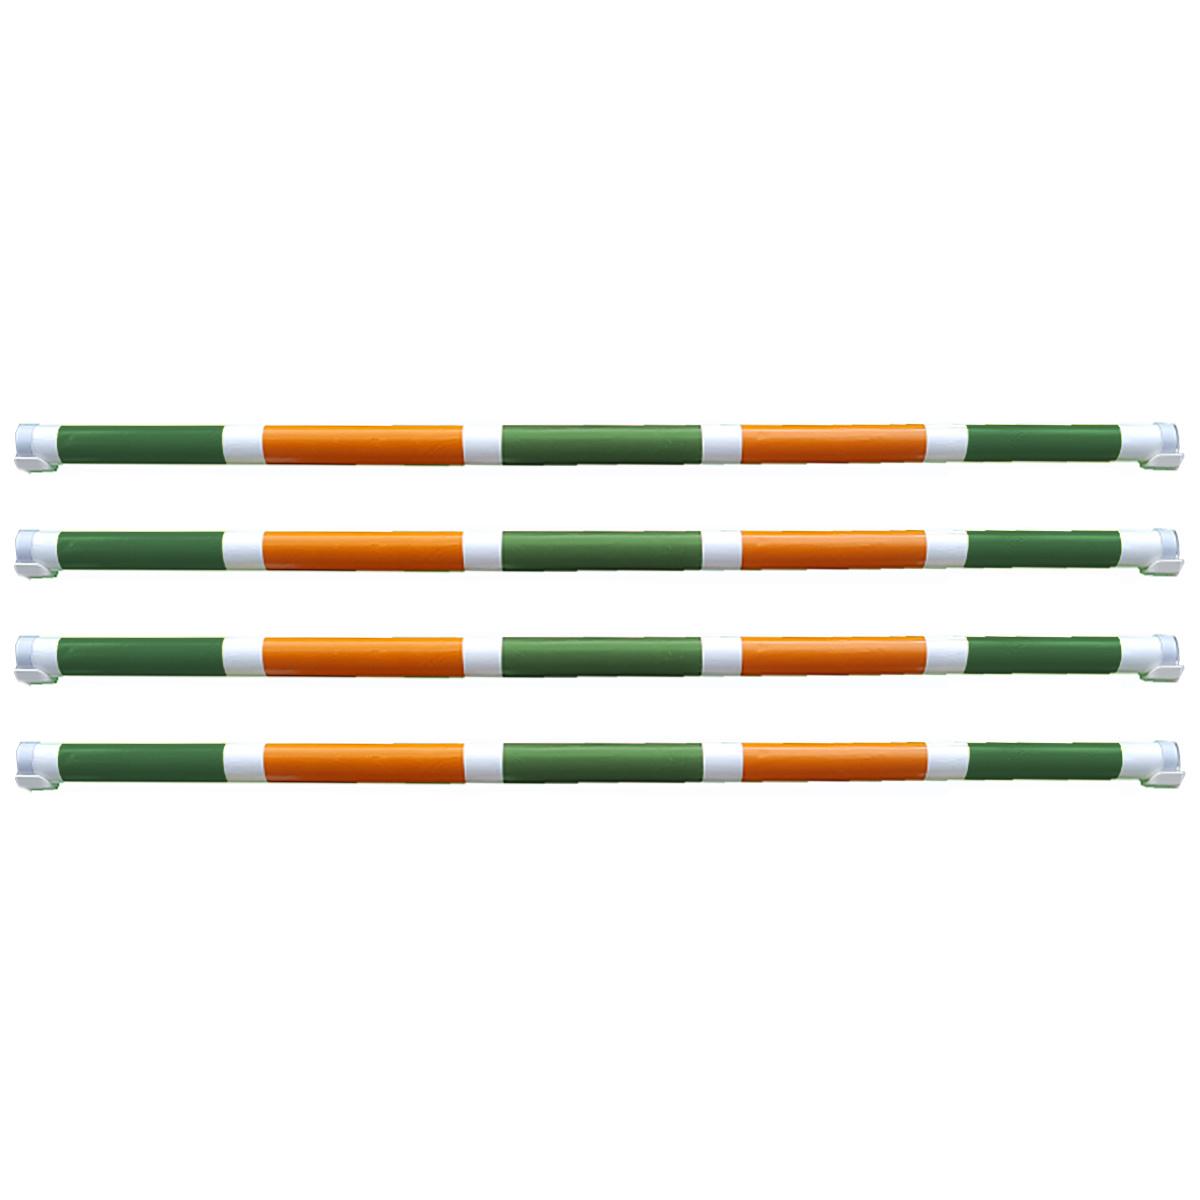 Hindernisbalk *Basic serie* groen, wit, oranje